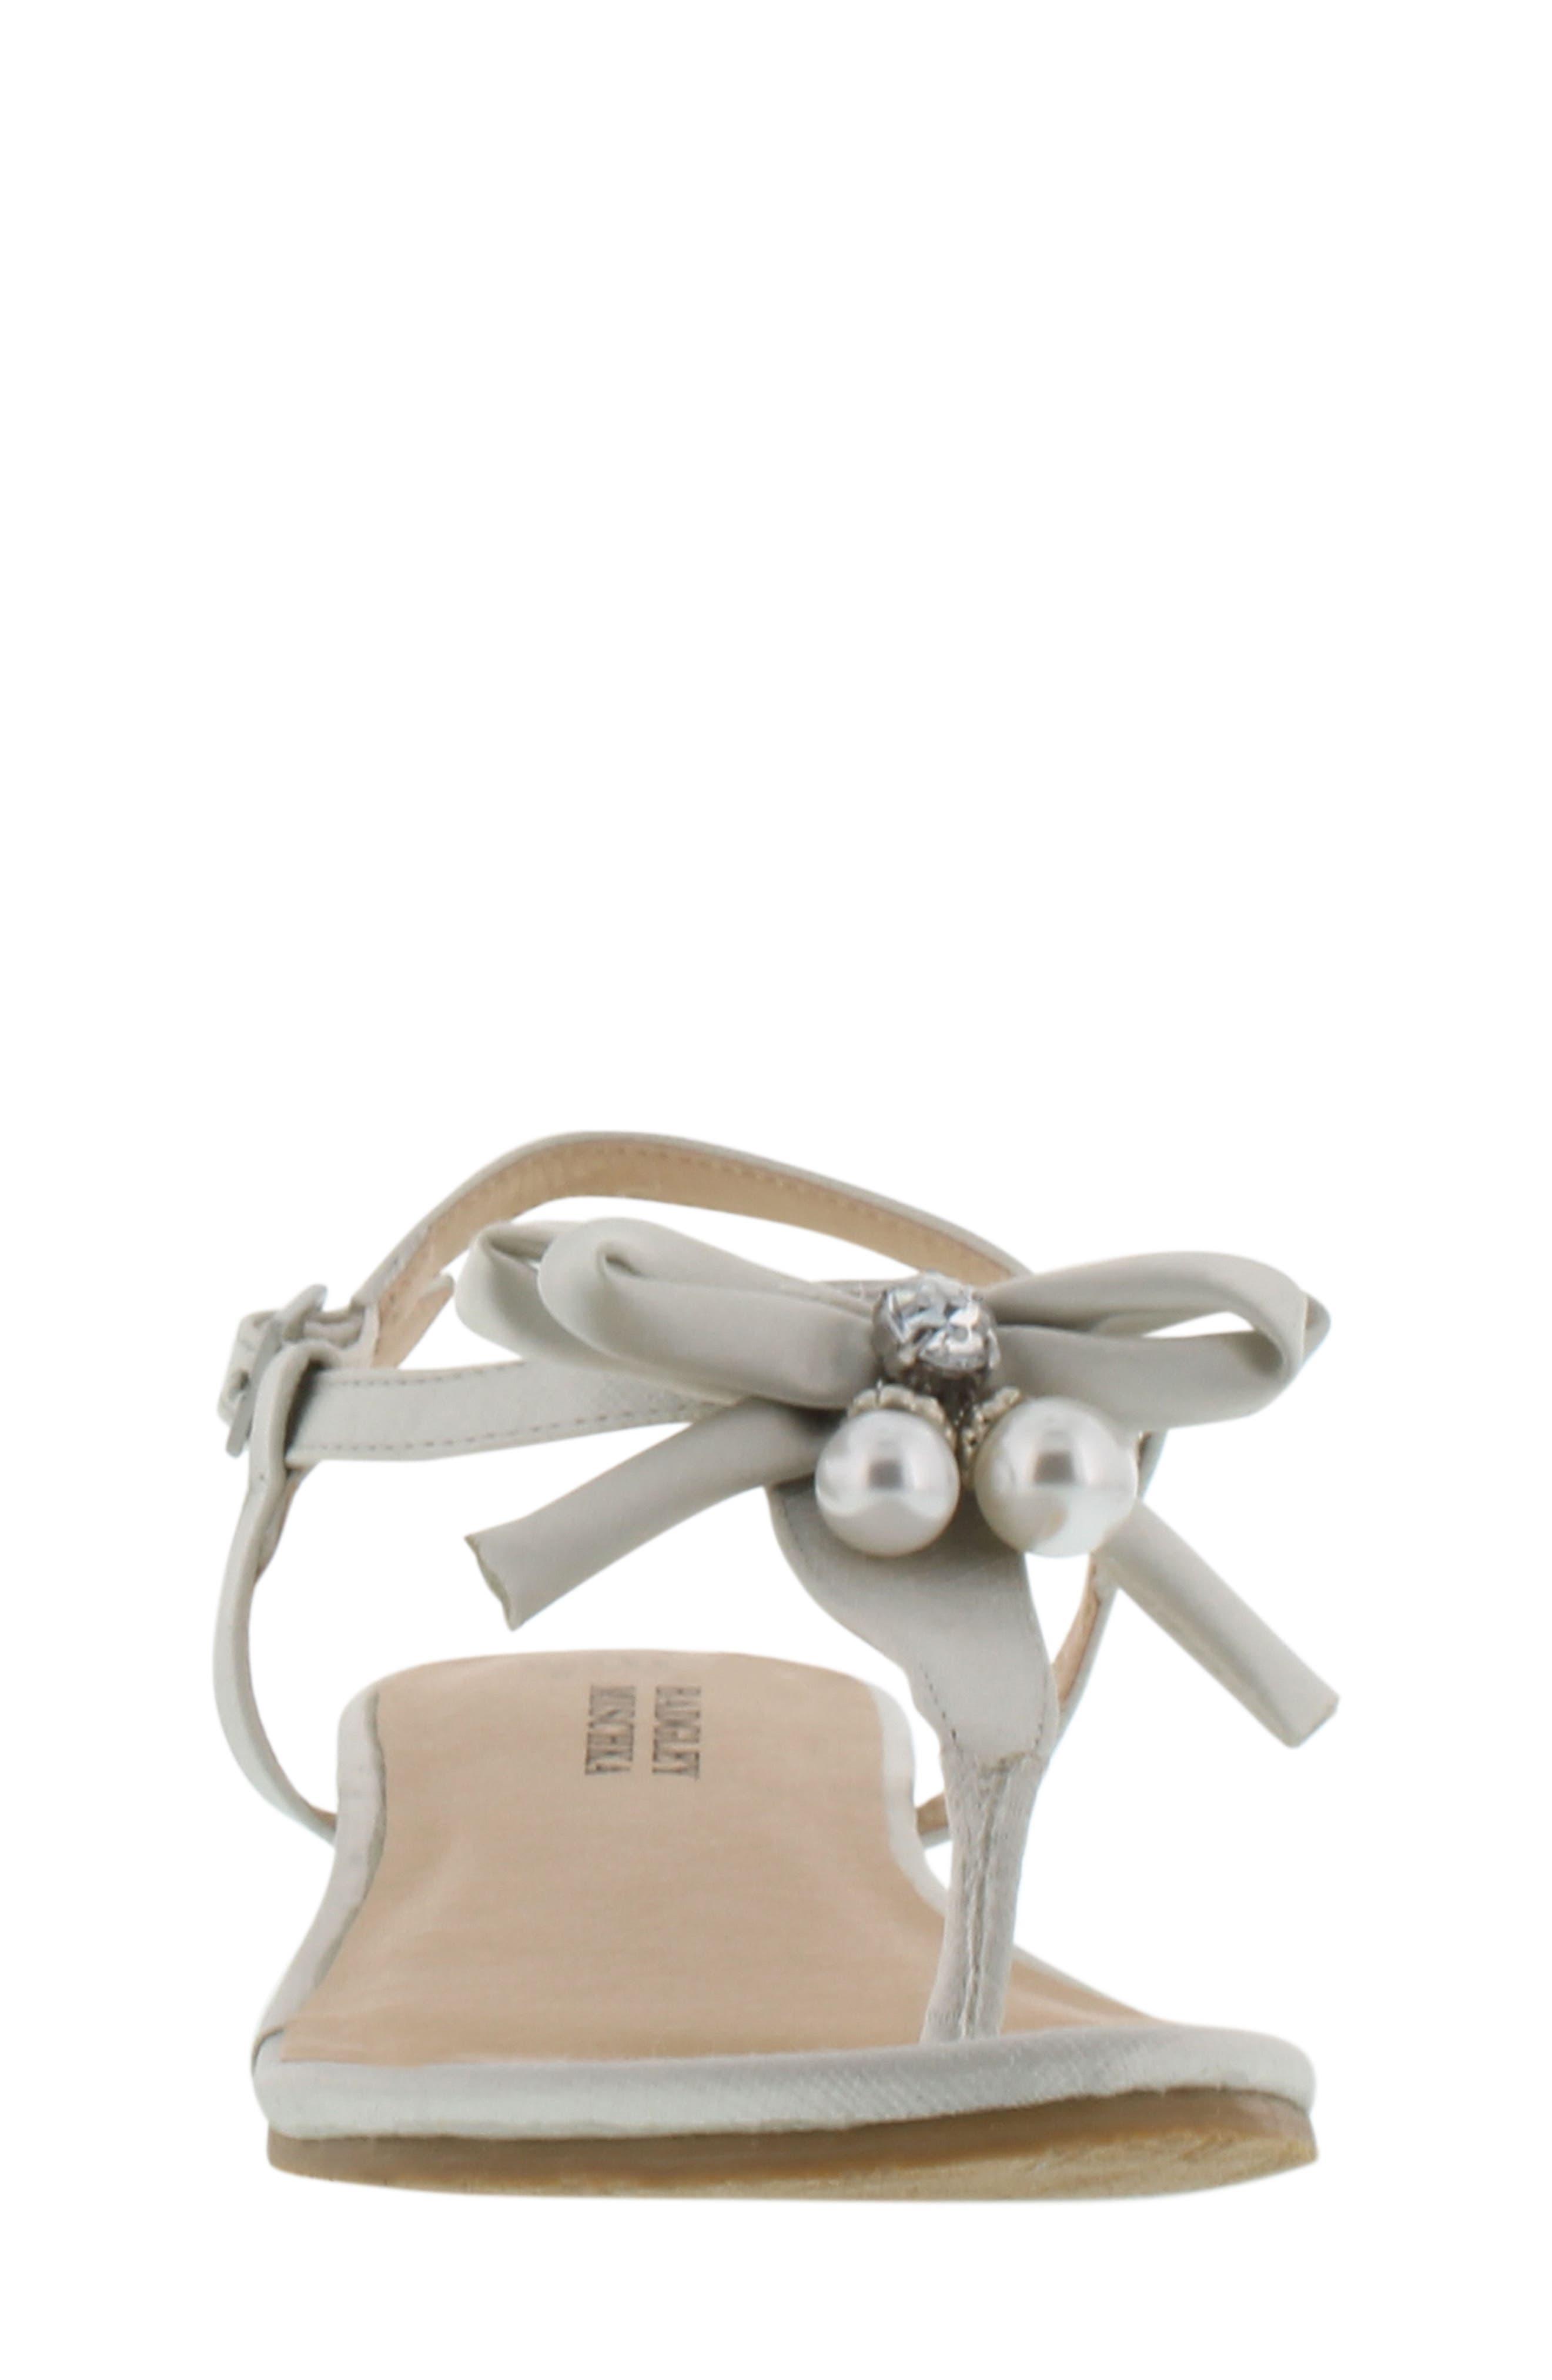 Talia Embellished Bow Sandal,                             Alternate thumbnail 4, color,                             040